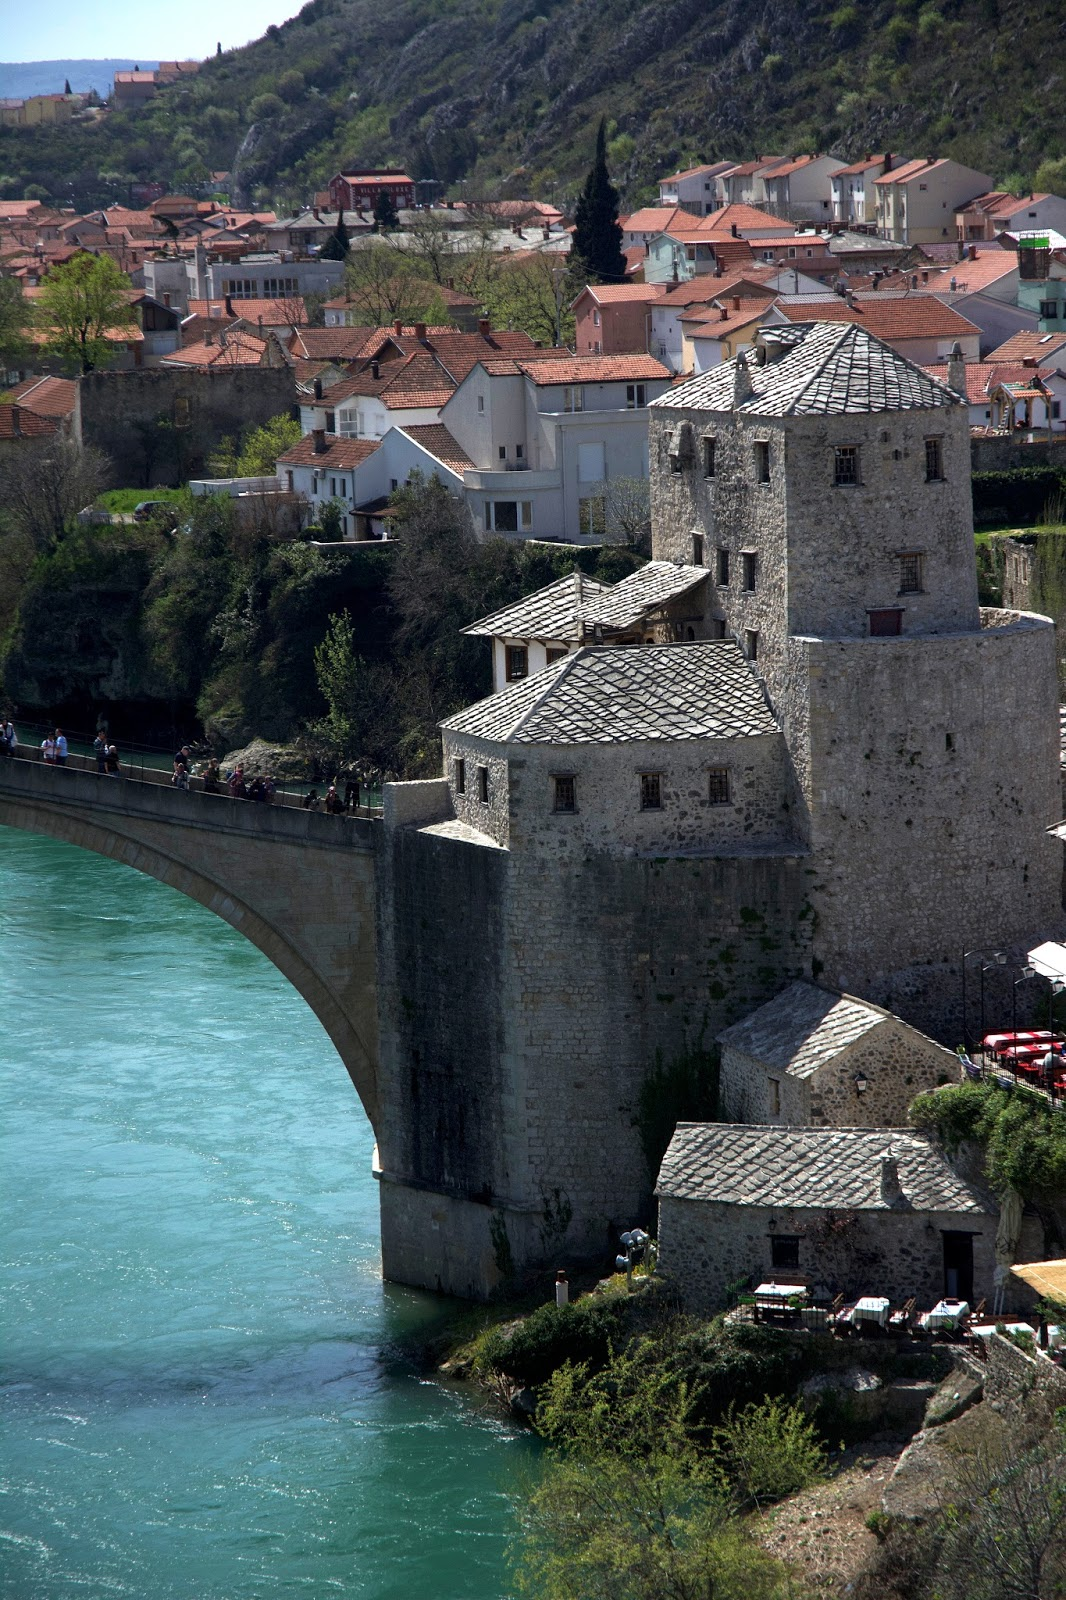 Mostar, Bosnia and Herzegovina 2018